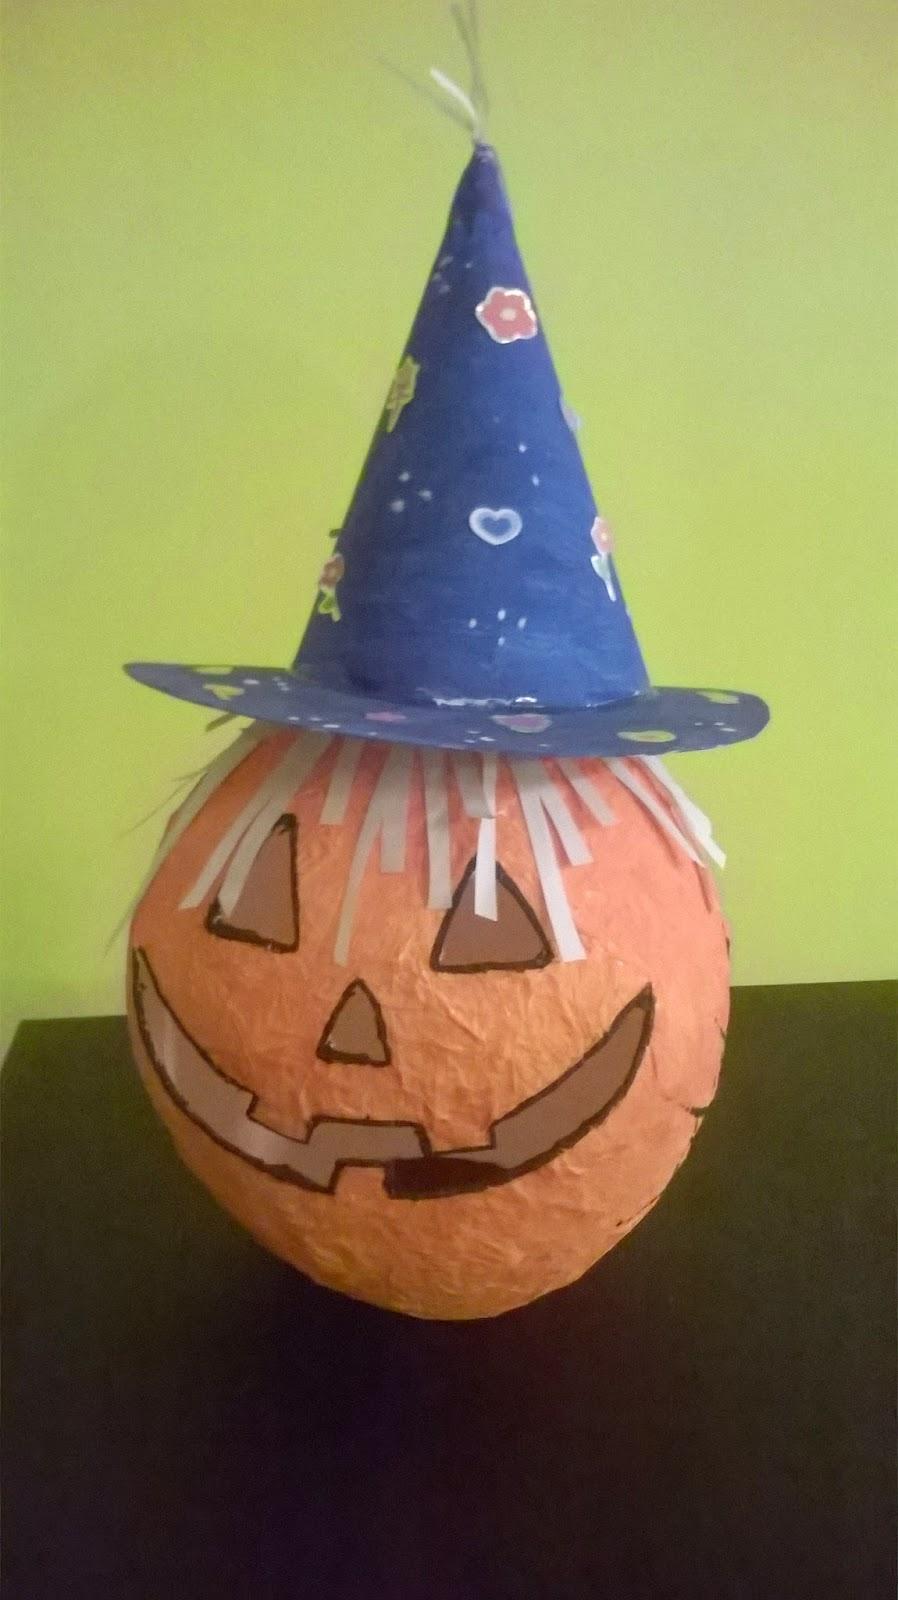 Zucca Halloween Cartapesta.Un Tuffo Nei Libri Angolo Creazioni Zucca Di Halloween In Cartapesta